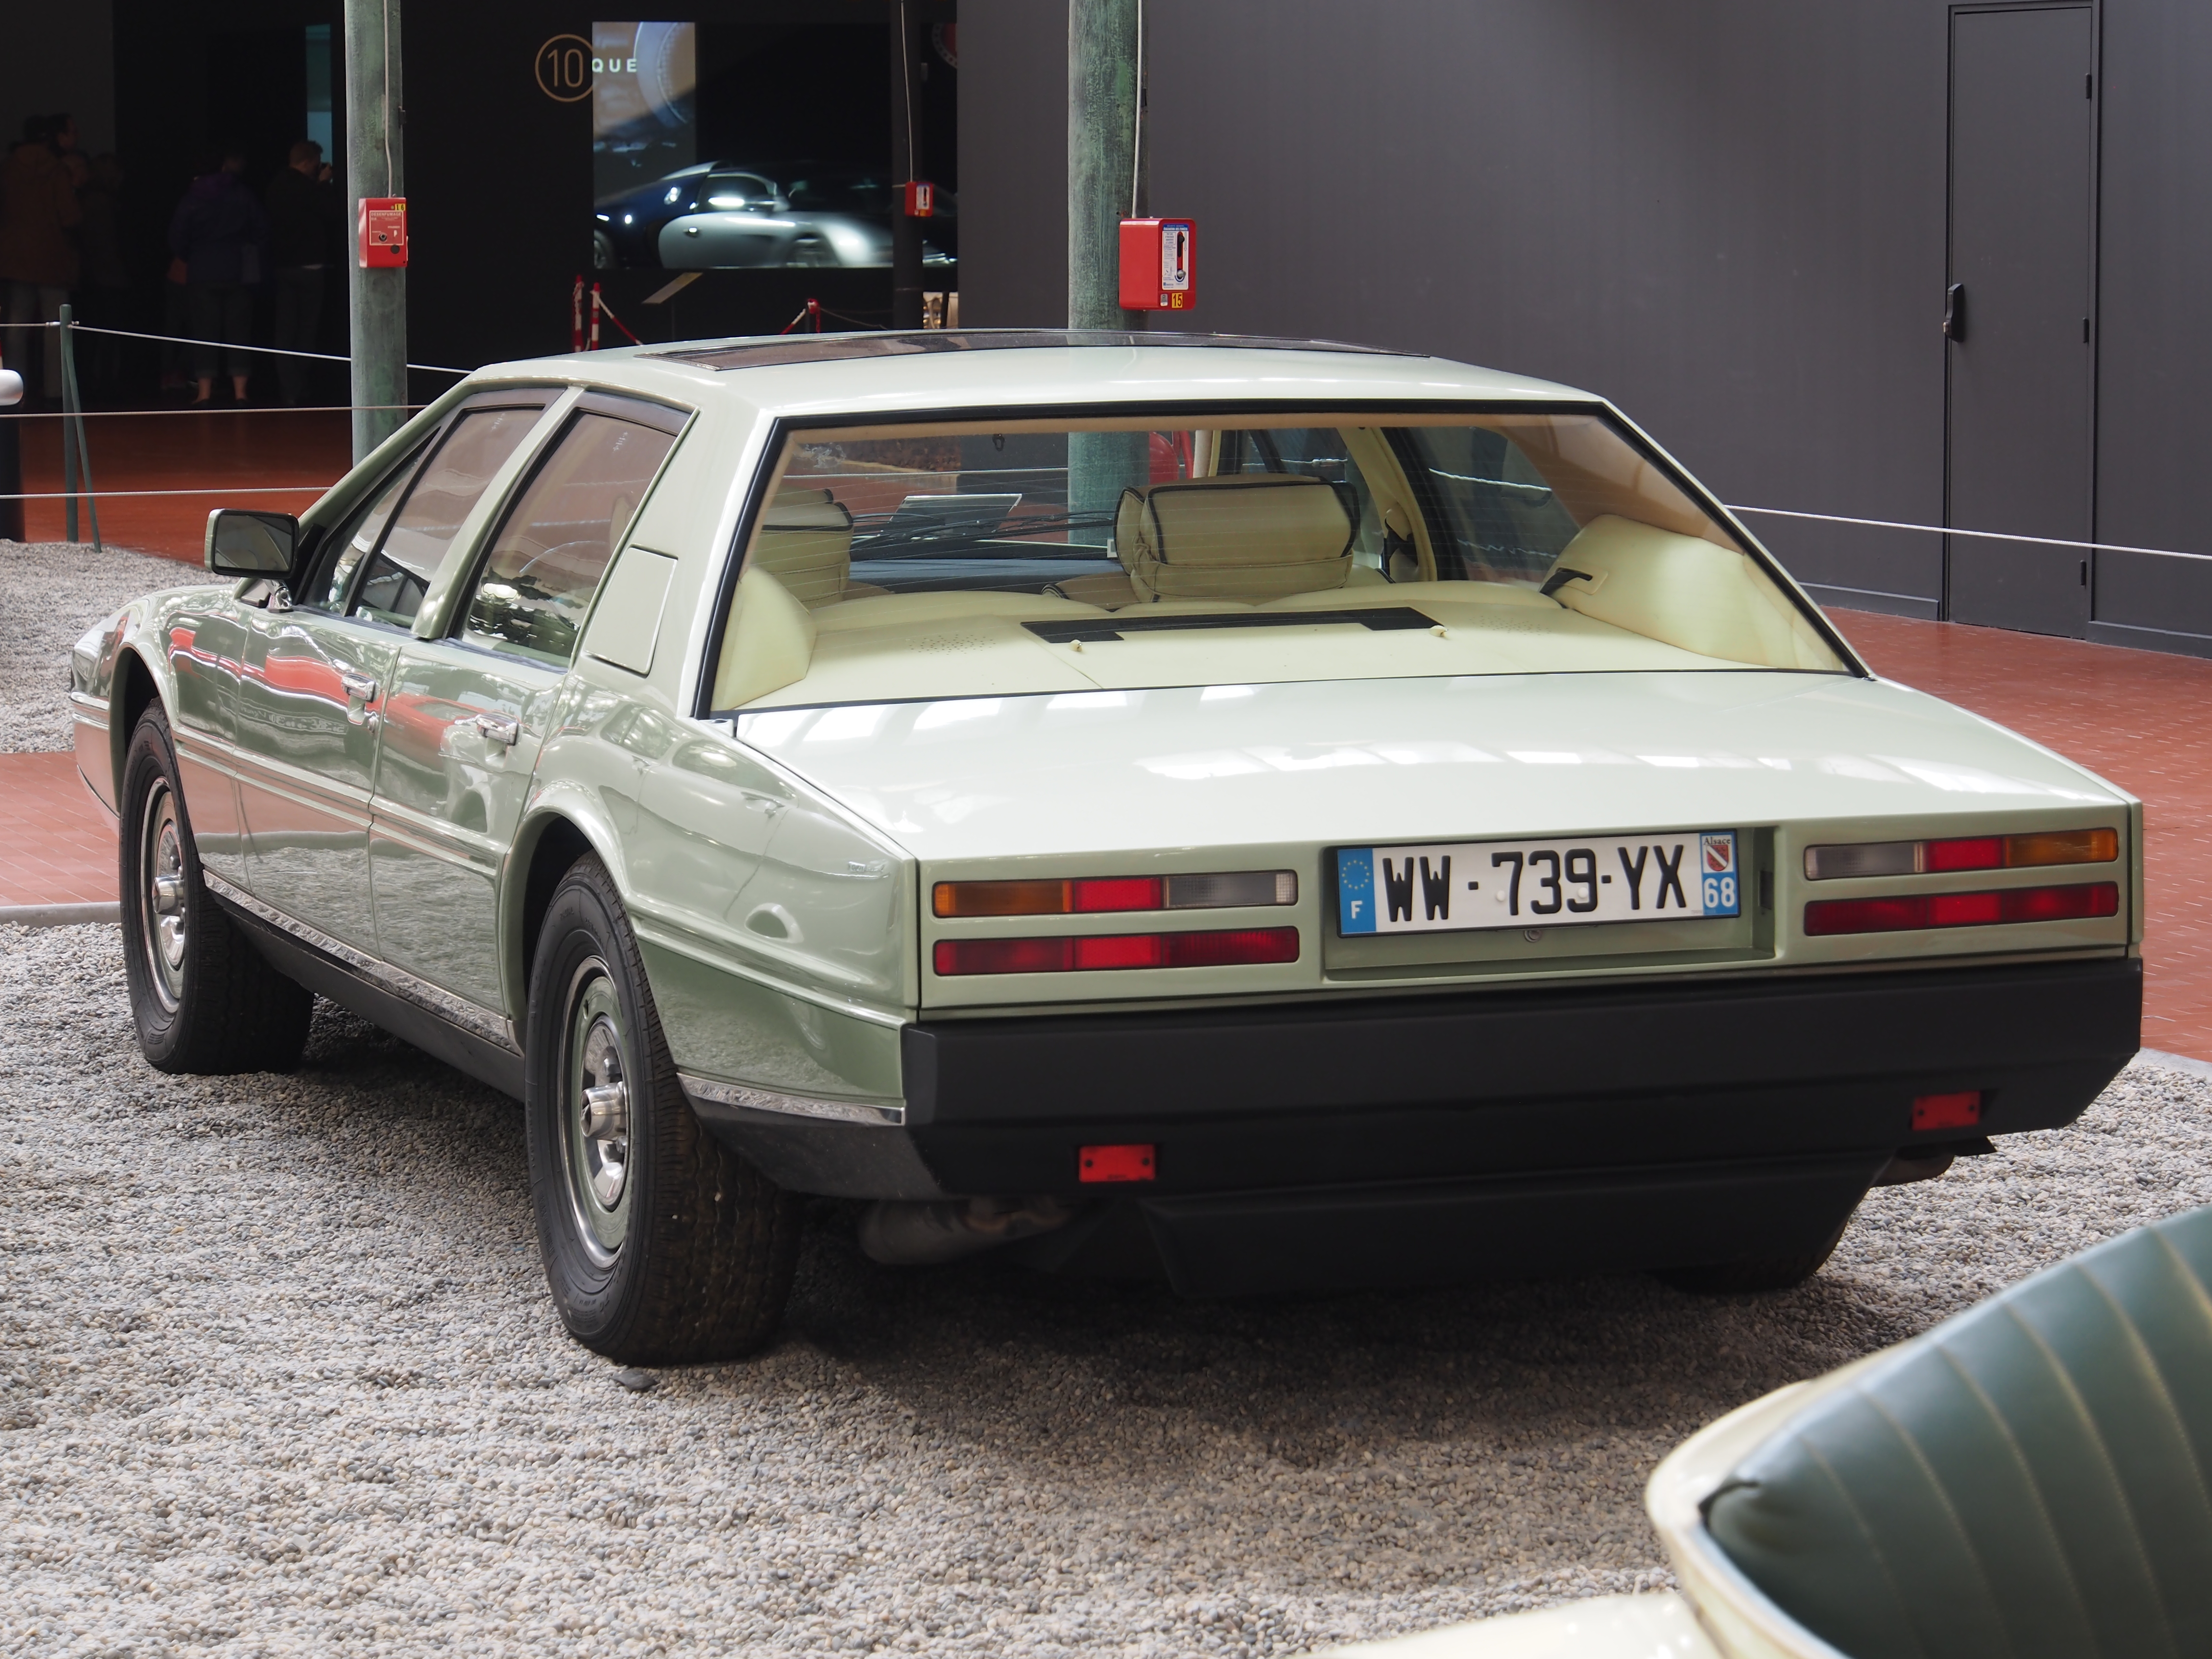 File 1982 Aston Martin Lagonda Series 2 V8 5340cm3 309hp 225kmh Pic7 Jpg Wikimedia Commons